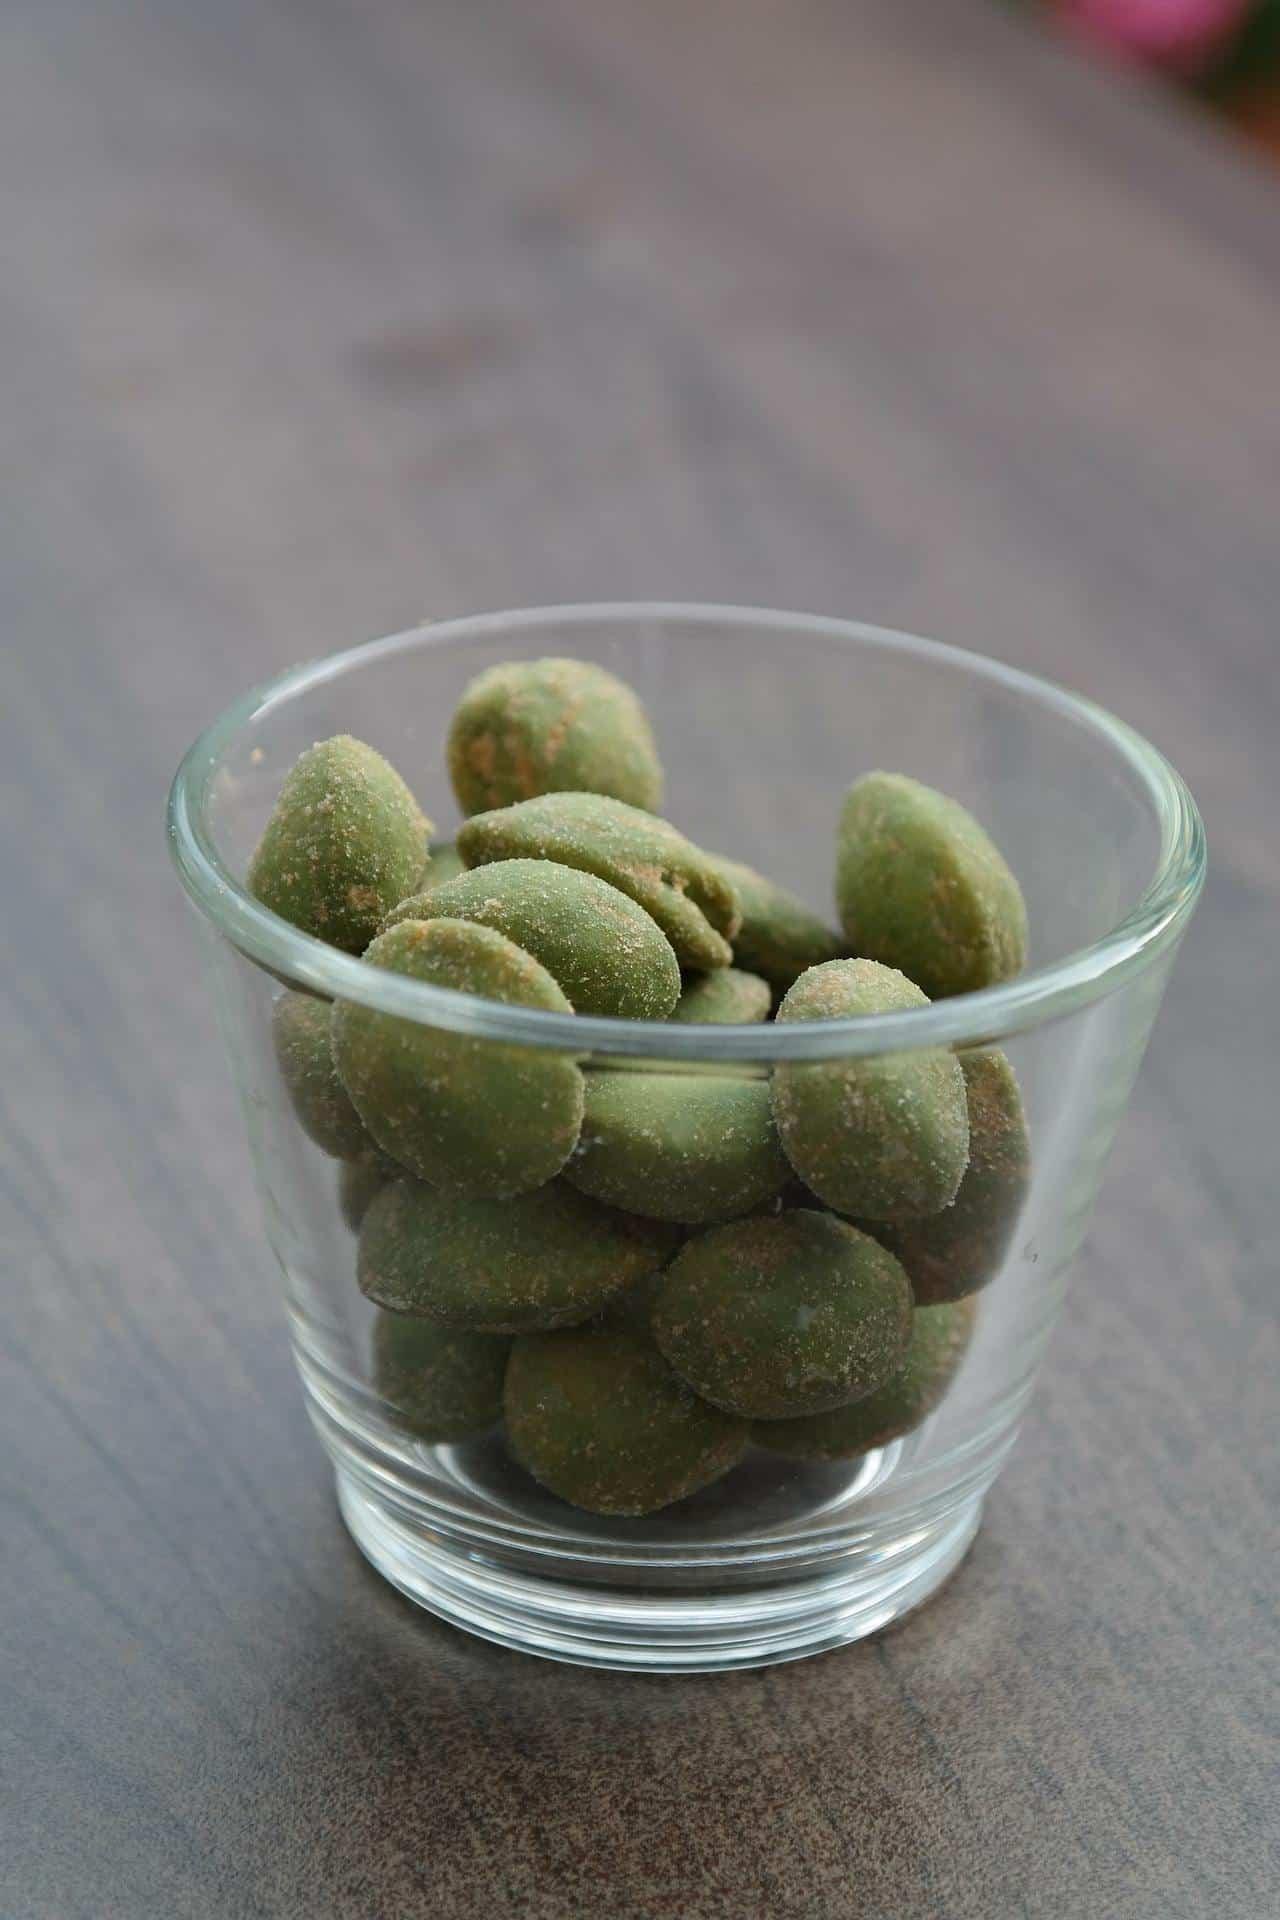 Natural appetite curber Wasabi